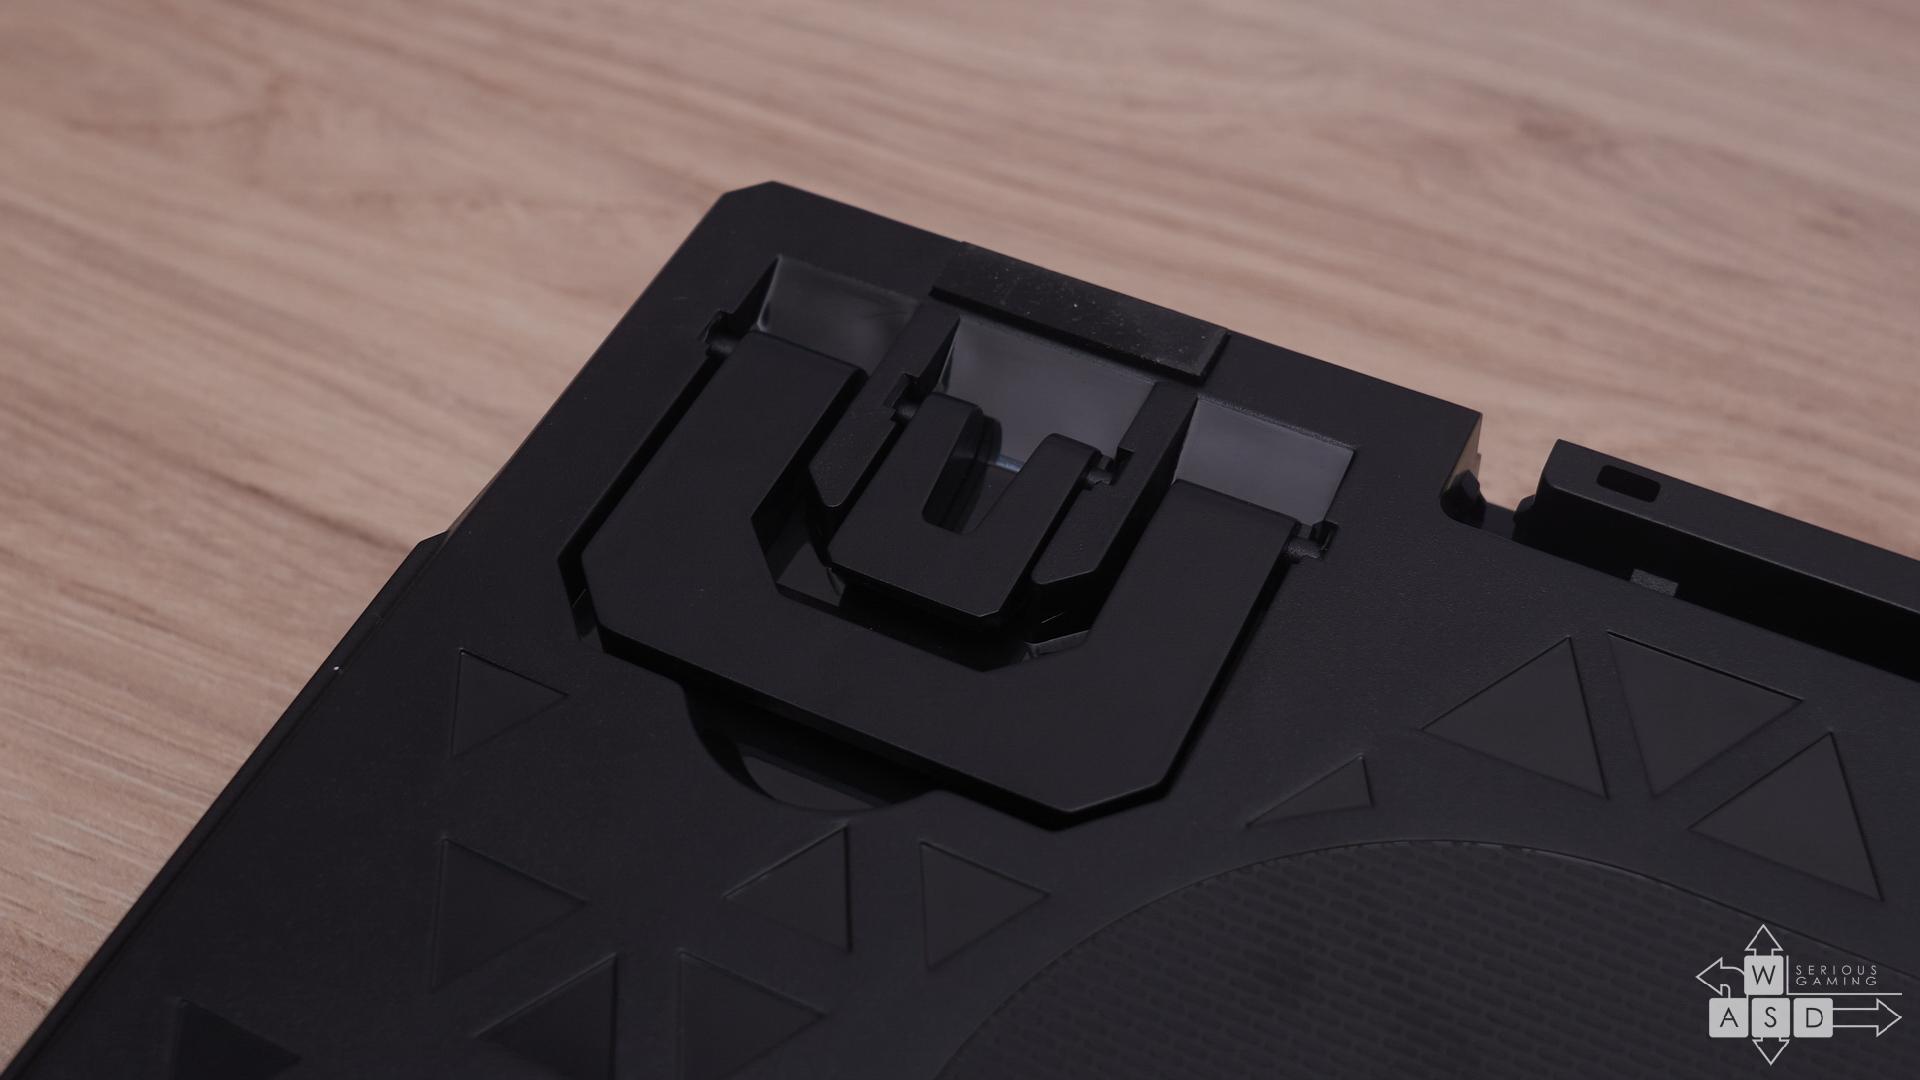 SPC Gear GK630K Tournament Kailh RGB review | WASD.ro